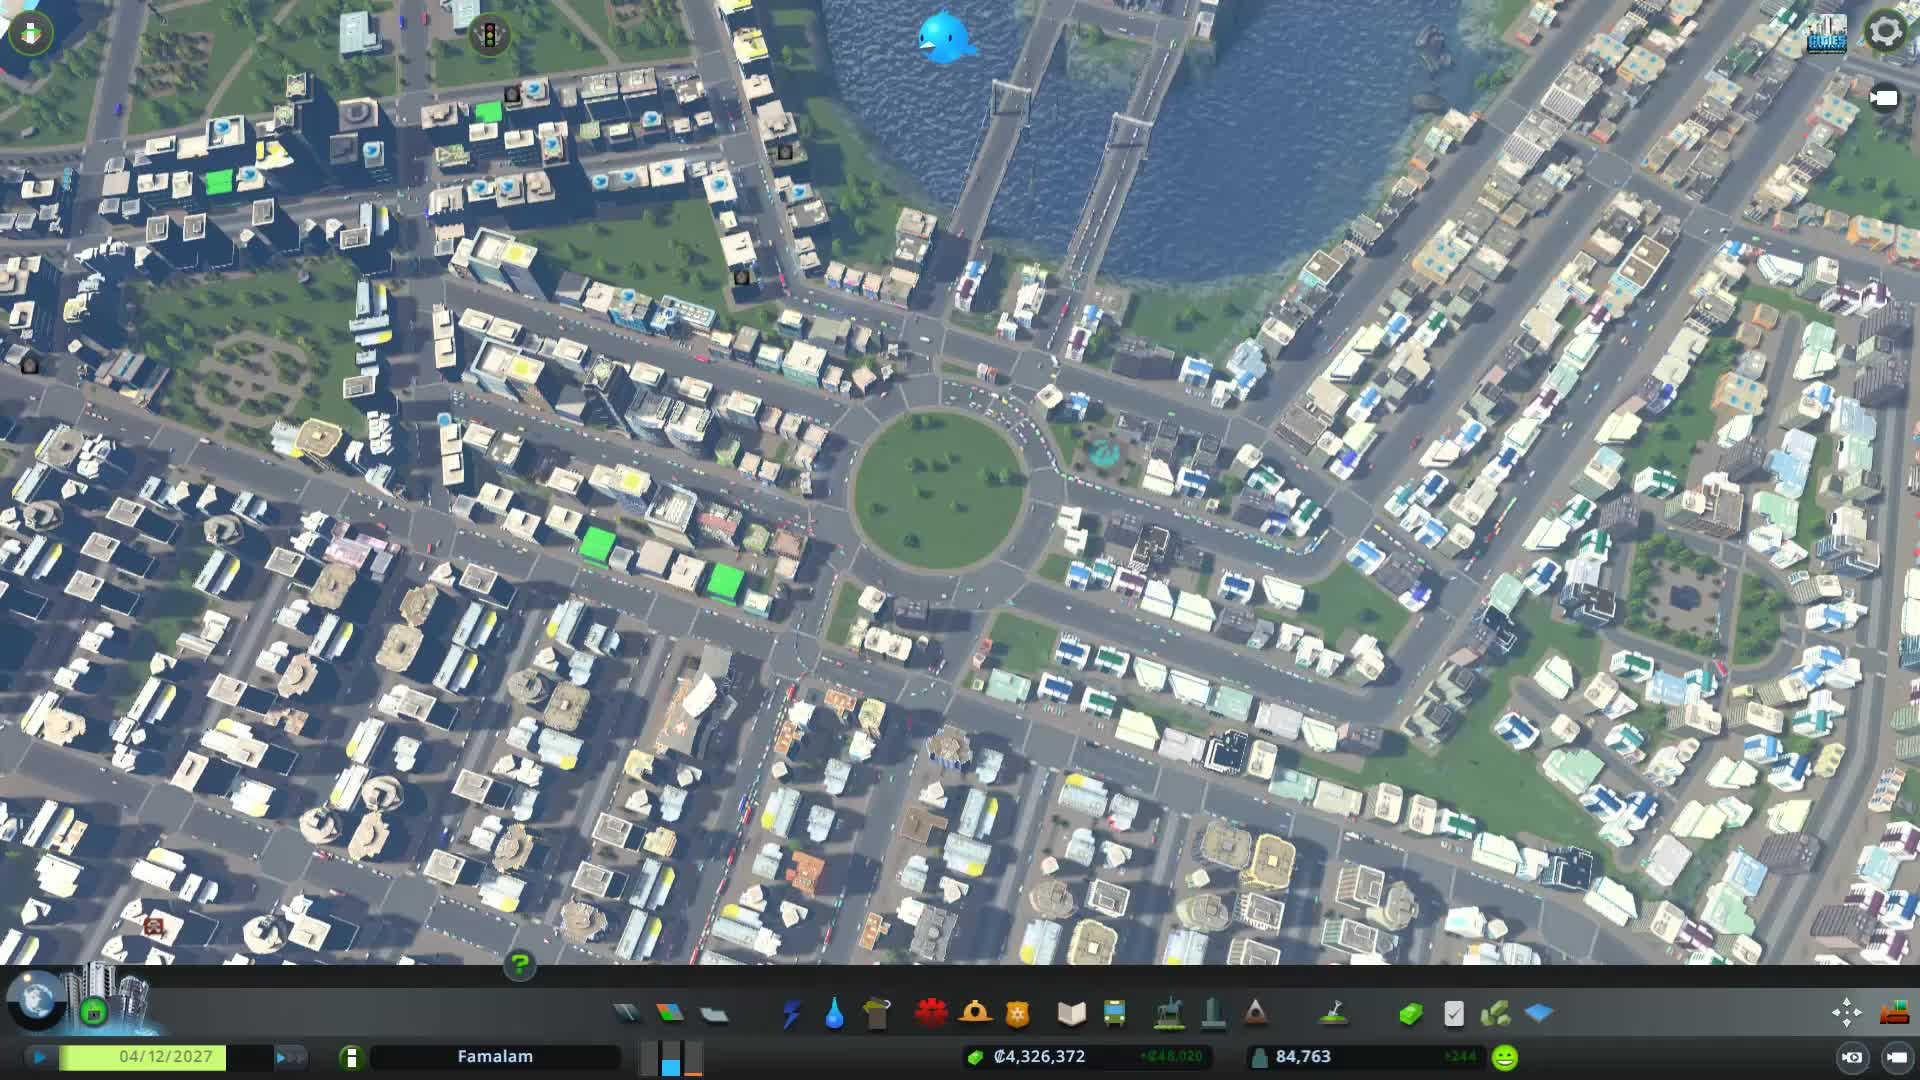 citiesskylines, Cities Skylines 2018.10.07 - 17.50.26.01 Trim GIFs